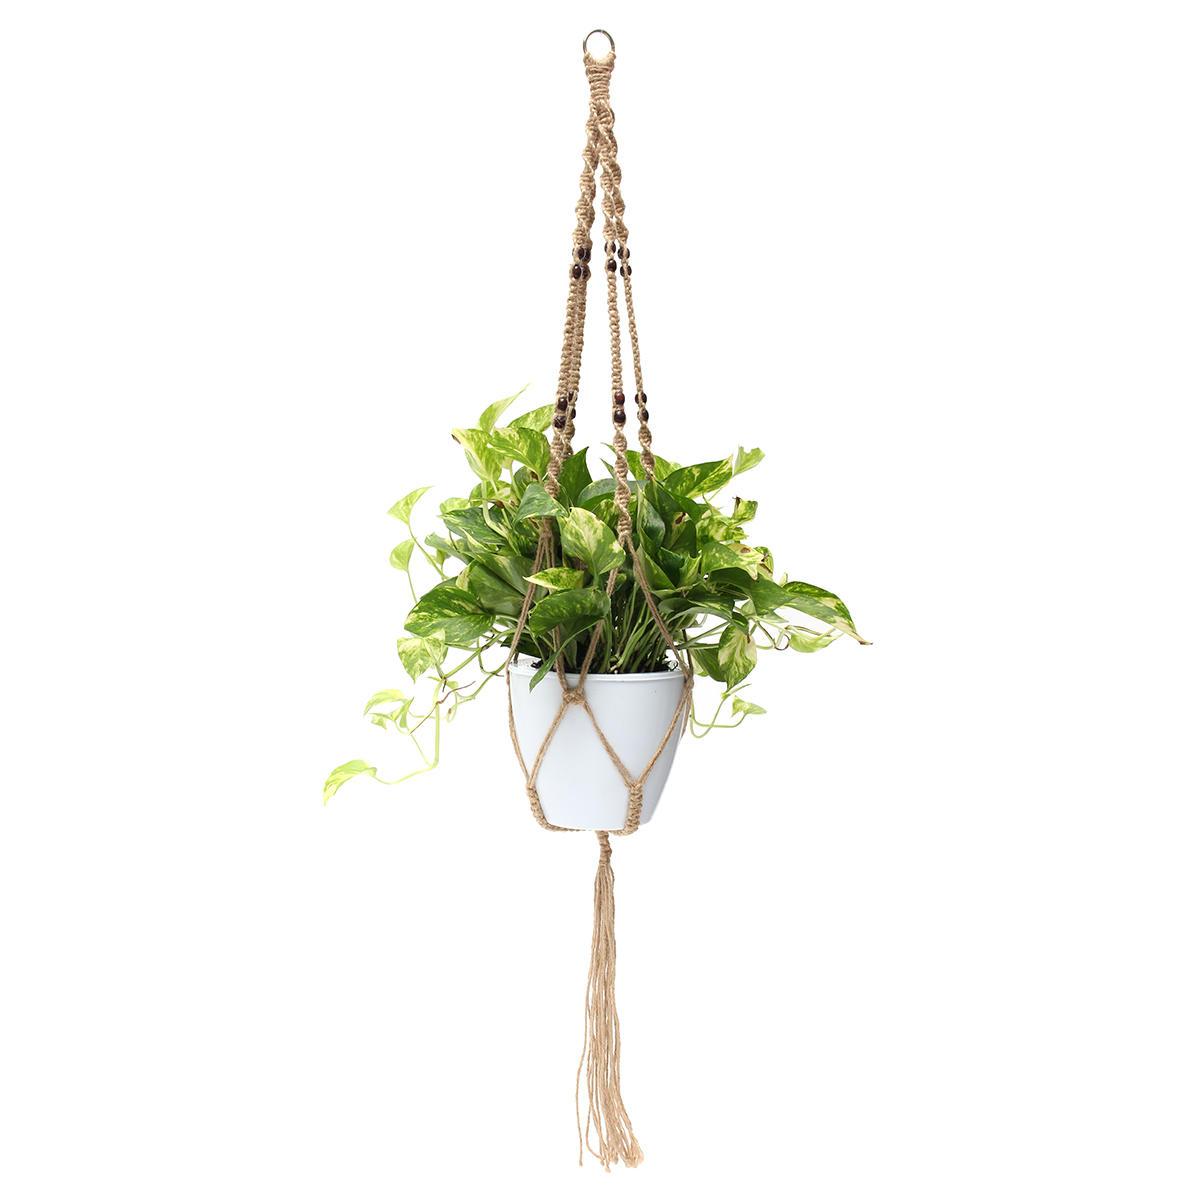 48 4 Legs Macrame Plant Hanger Holder Hanging Planter Basket Jute